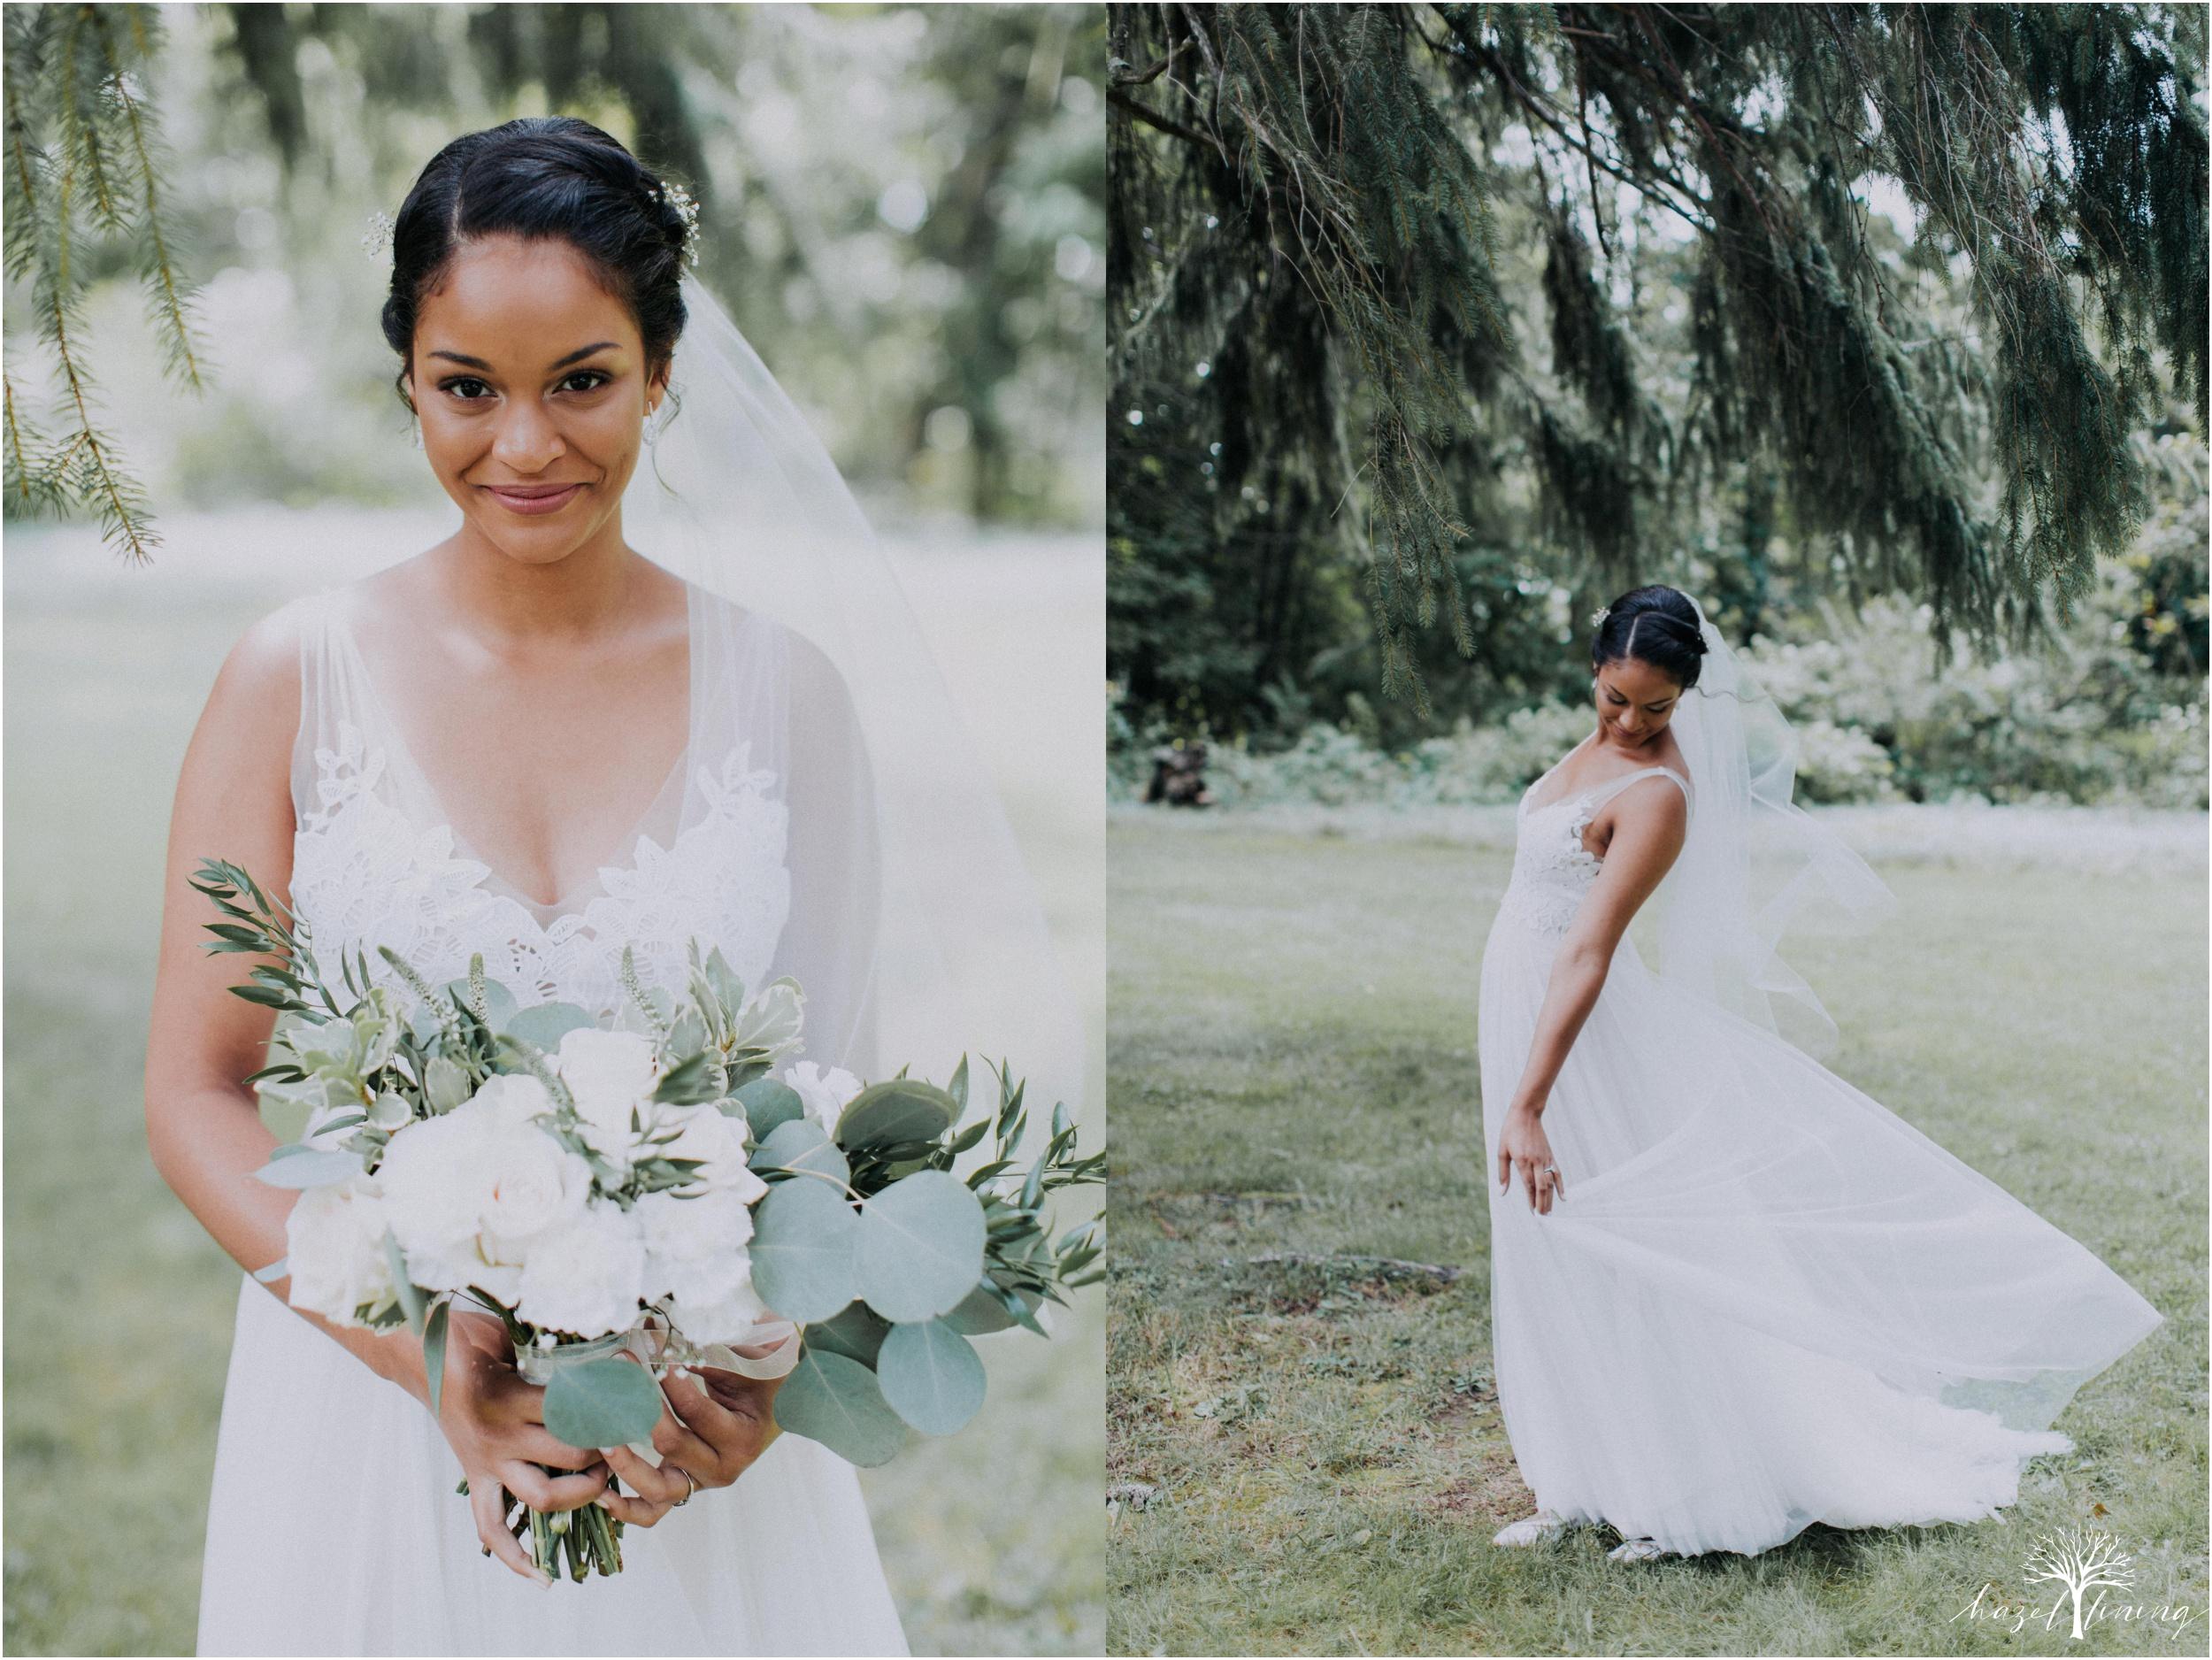 mariah-kreyling-samuel-sherratt-sherrattwiththeworld-peirce-farm-at-witch-hill-boston-massachusetts-wedding-photography-hazel-lining-travel-wedding-elopement-photography_0048.jpg